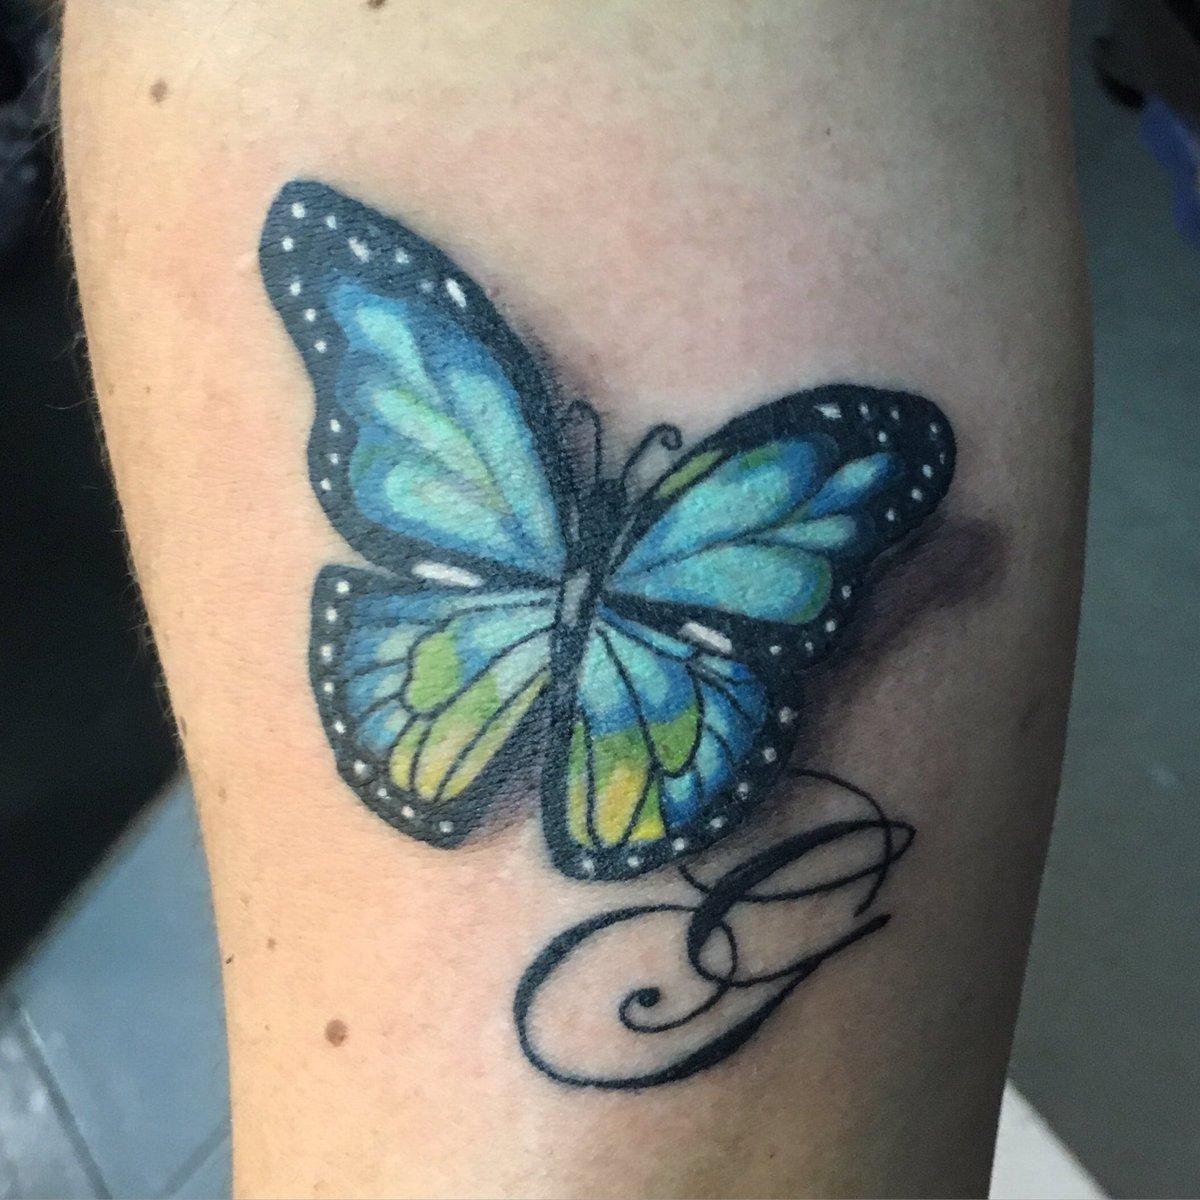 Leonardo Cuevas On Twitter Butterflytattoo Colortattoo Tattoo